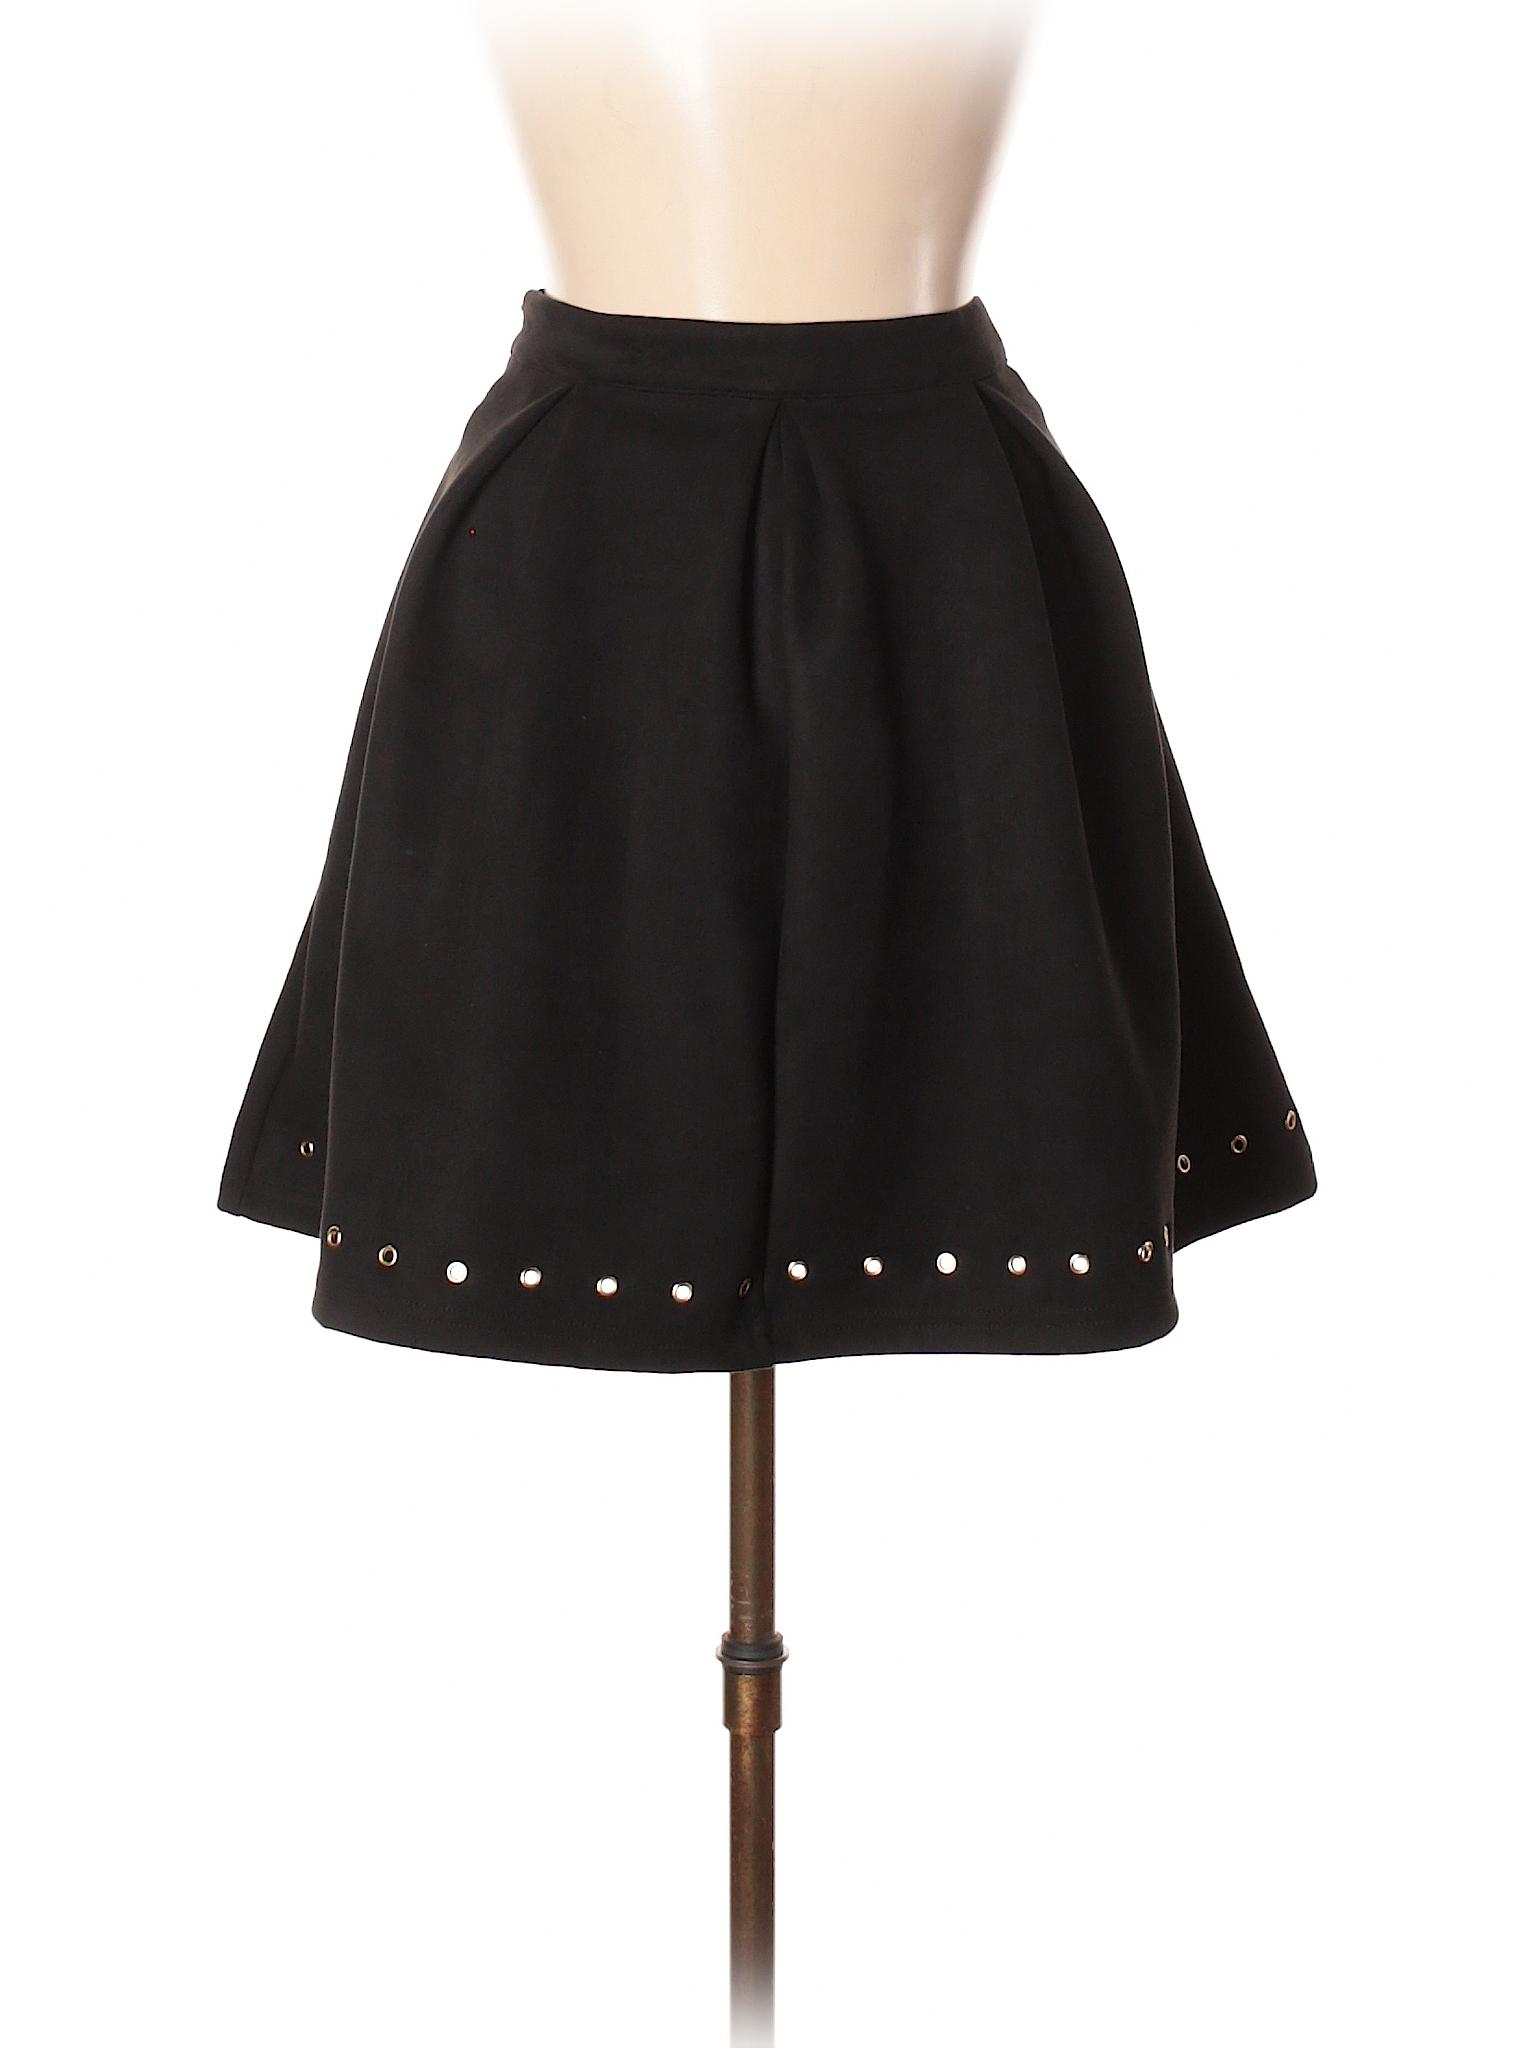 Skirt Boutique Boutique Boutique Skirt Casual Casual Boutique Casual Skirt Casual aWRqqvUTF